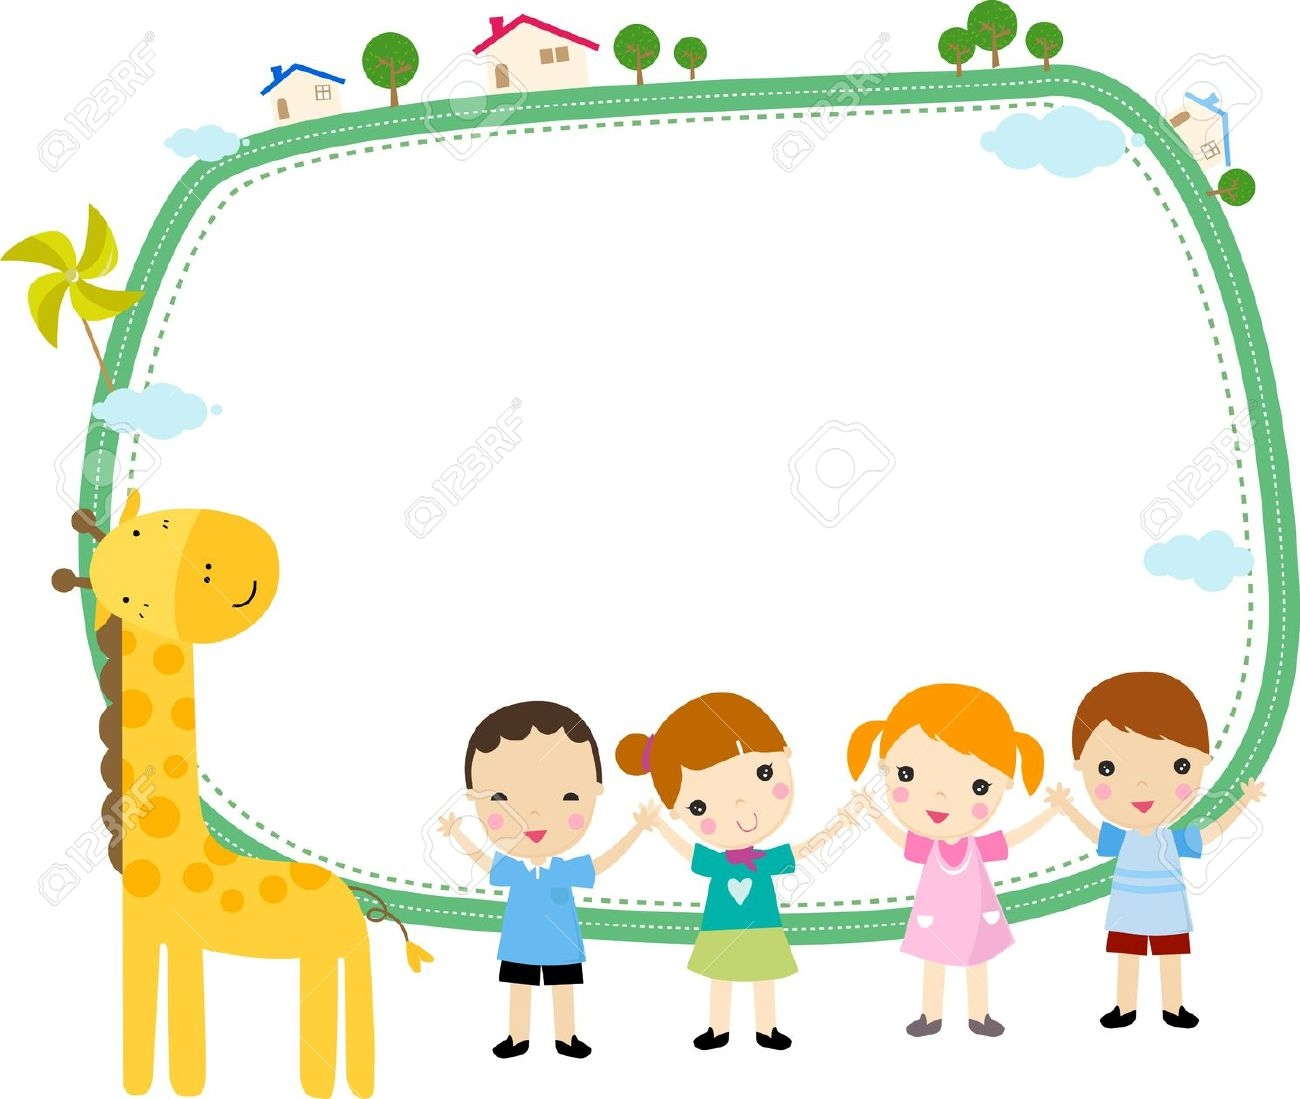 Preschool Border